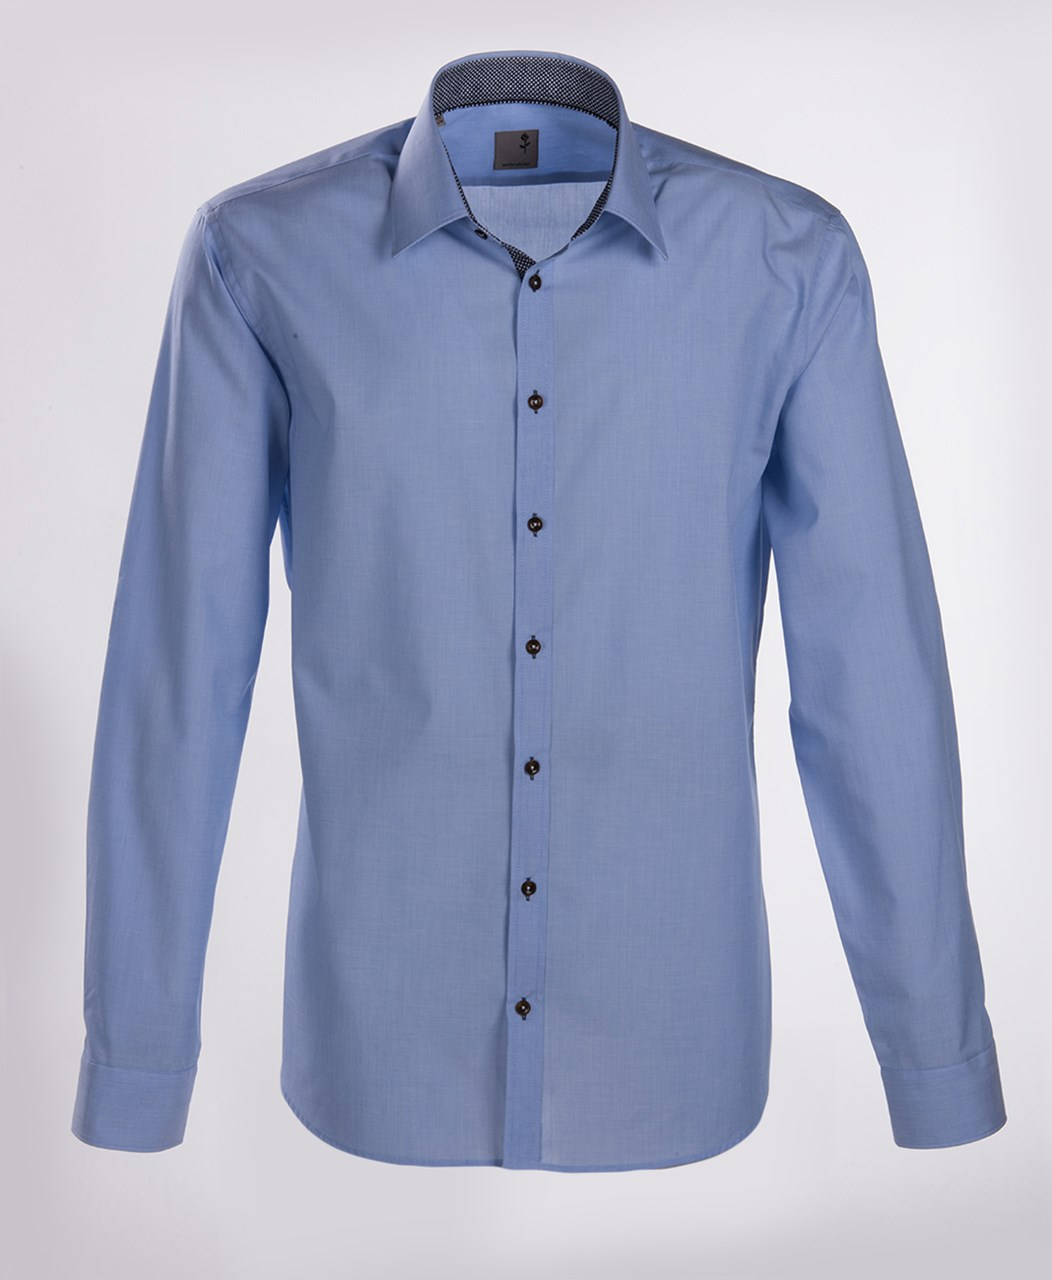 W M EGO. Modrá pánská košile SEIDENSTICKER b3f2b9af7c